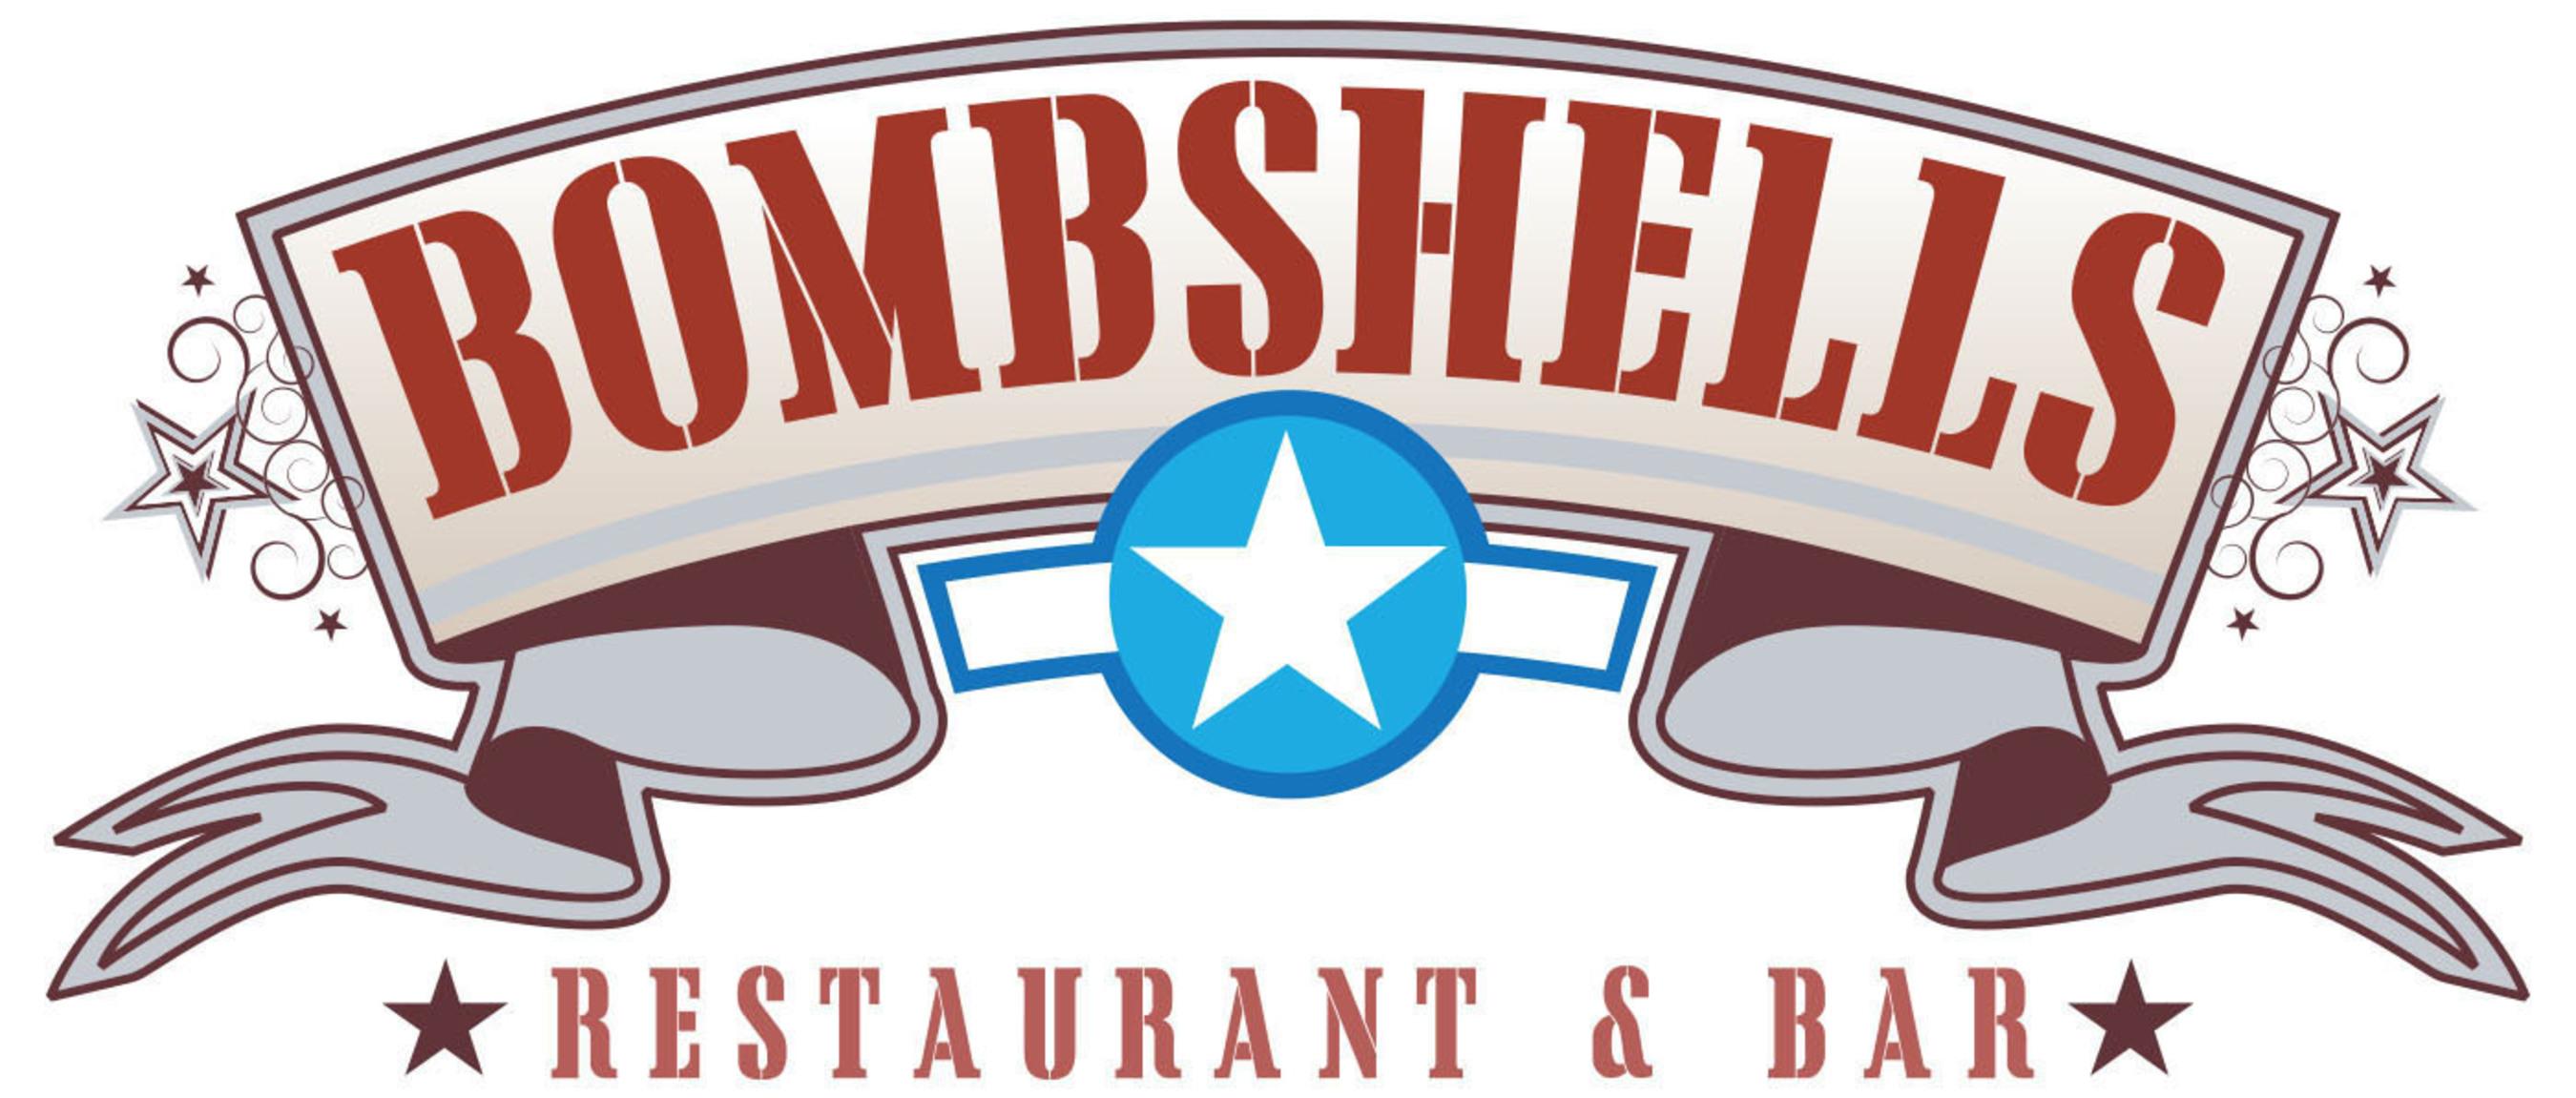 Bombshells Restaurant & Bar Logo (PRNewsFoto/RCI Hospitality Holdings, Inc.)